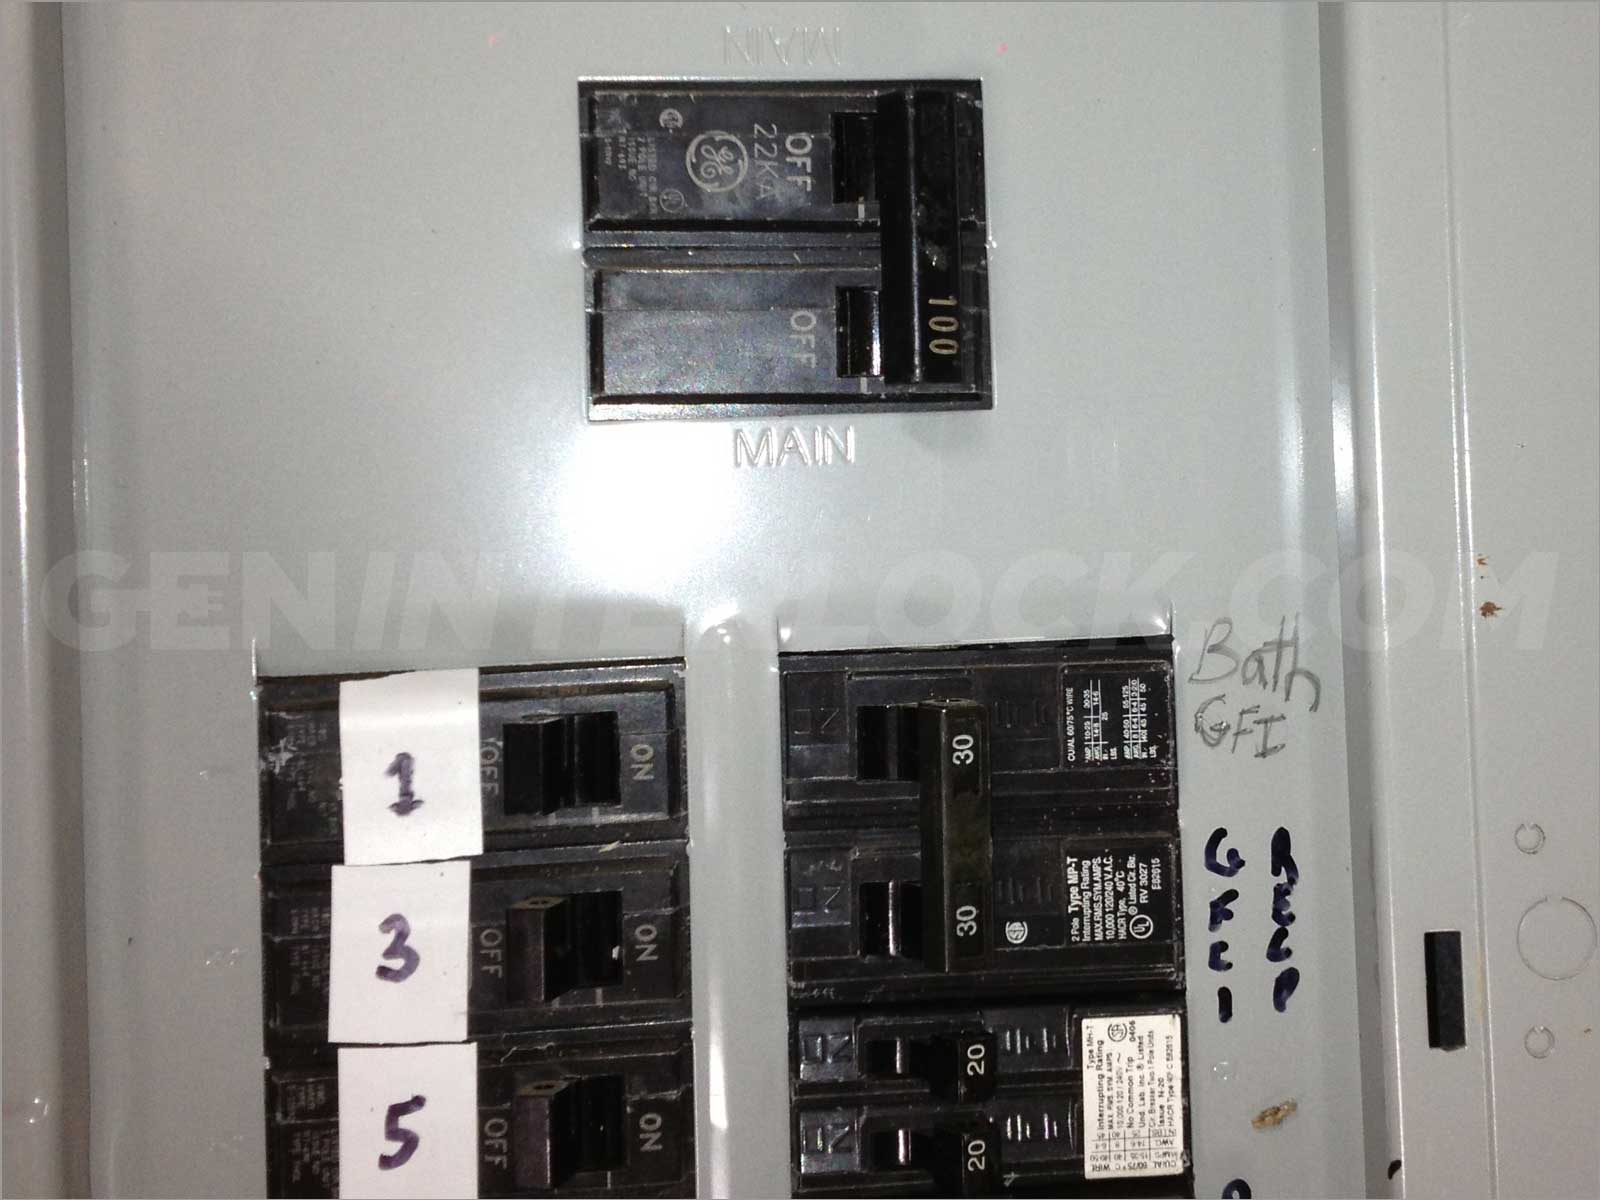 ge100_u_lg Upgrade A Fuse Box To Circuit Breakers on fuse box to breaker box, fuse type circuit breakers, fuse box cables, fuse box diode, fuse box wiring, fuse box conduit,